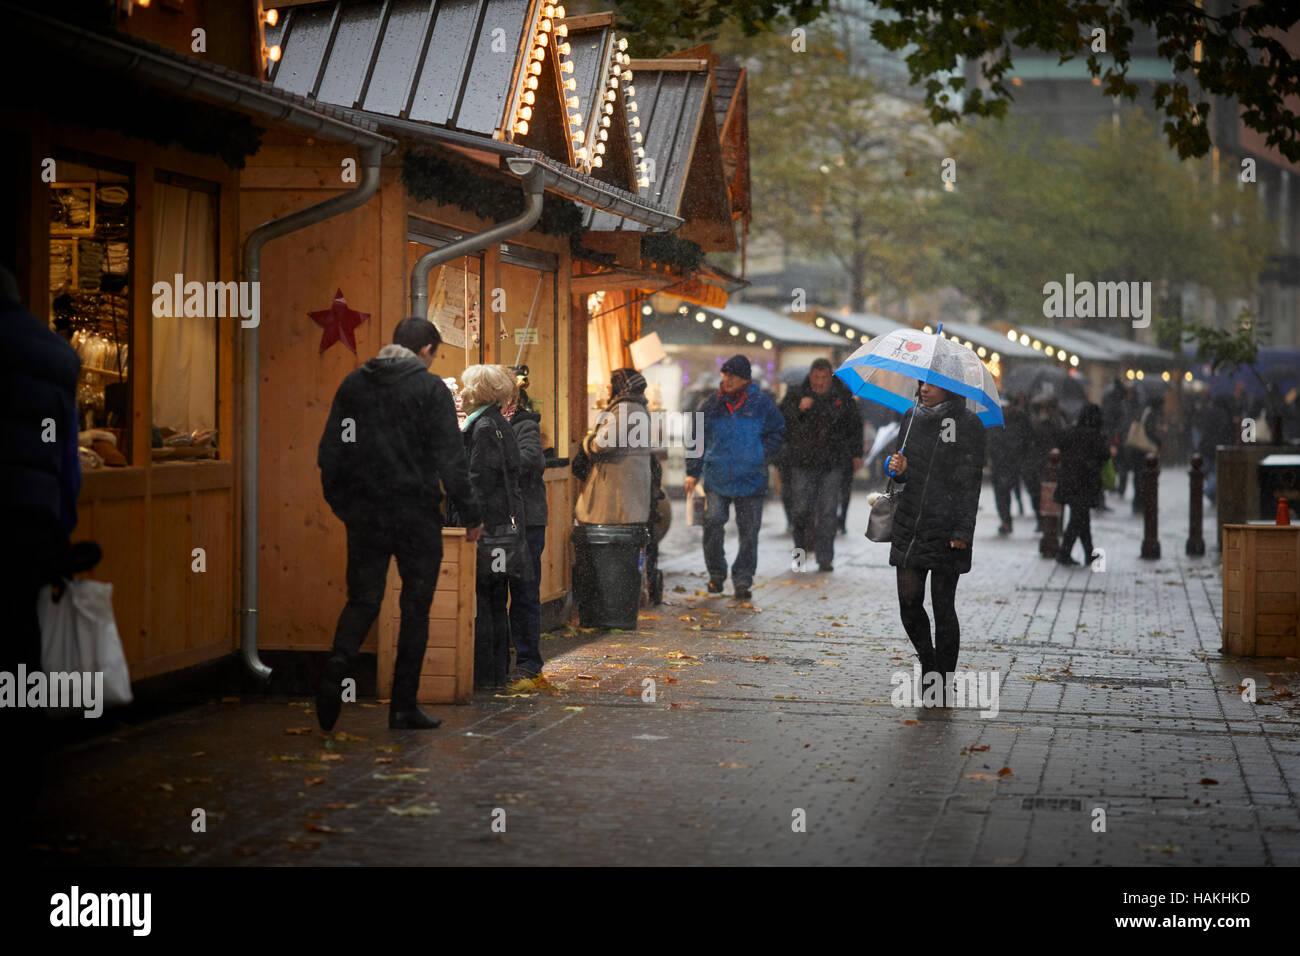 Manchester christmas markets rain  I love MCR umbrella up used street wooden huts wet dull winter scene Market bazaar - Stock Image